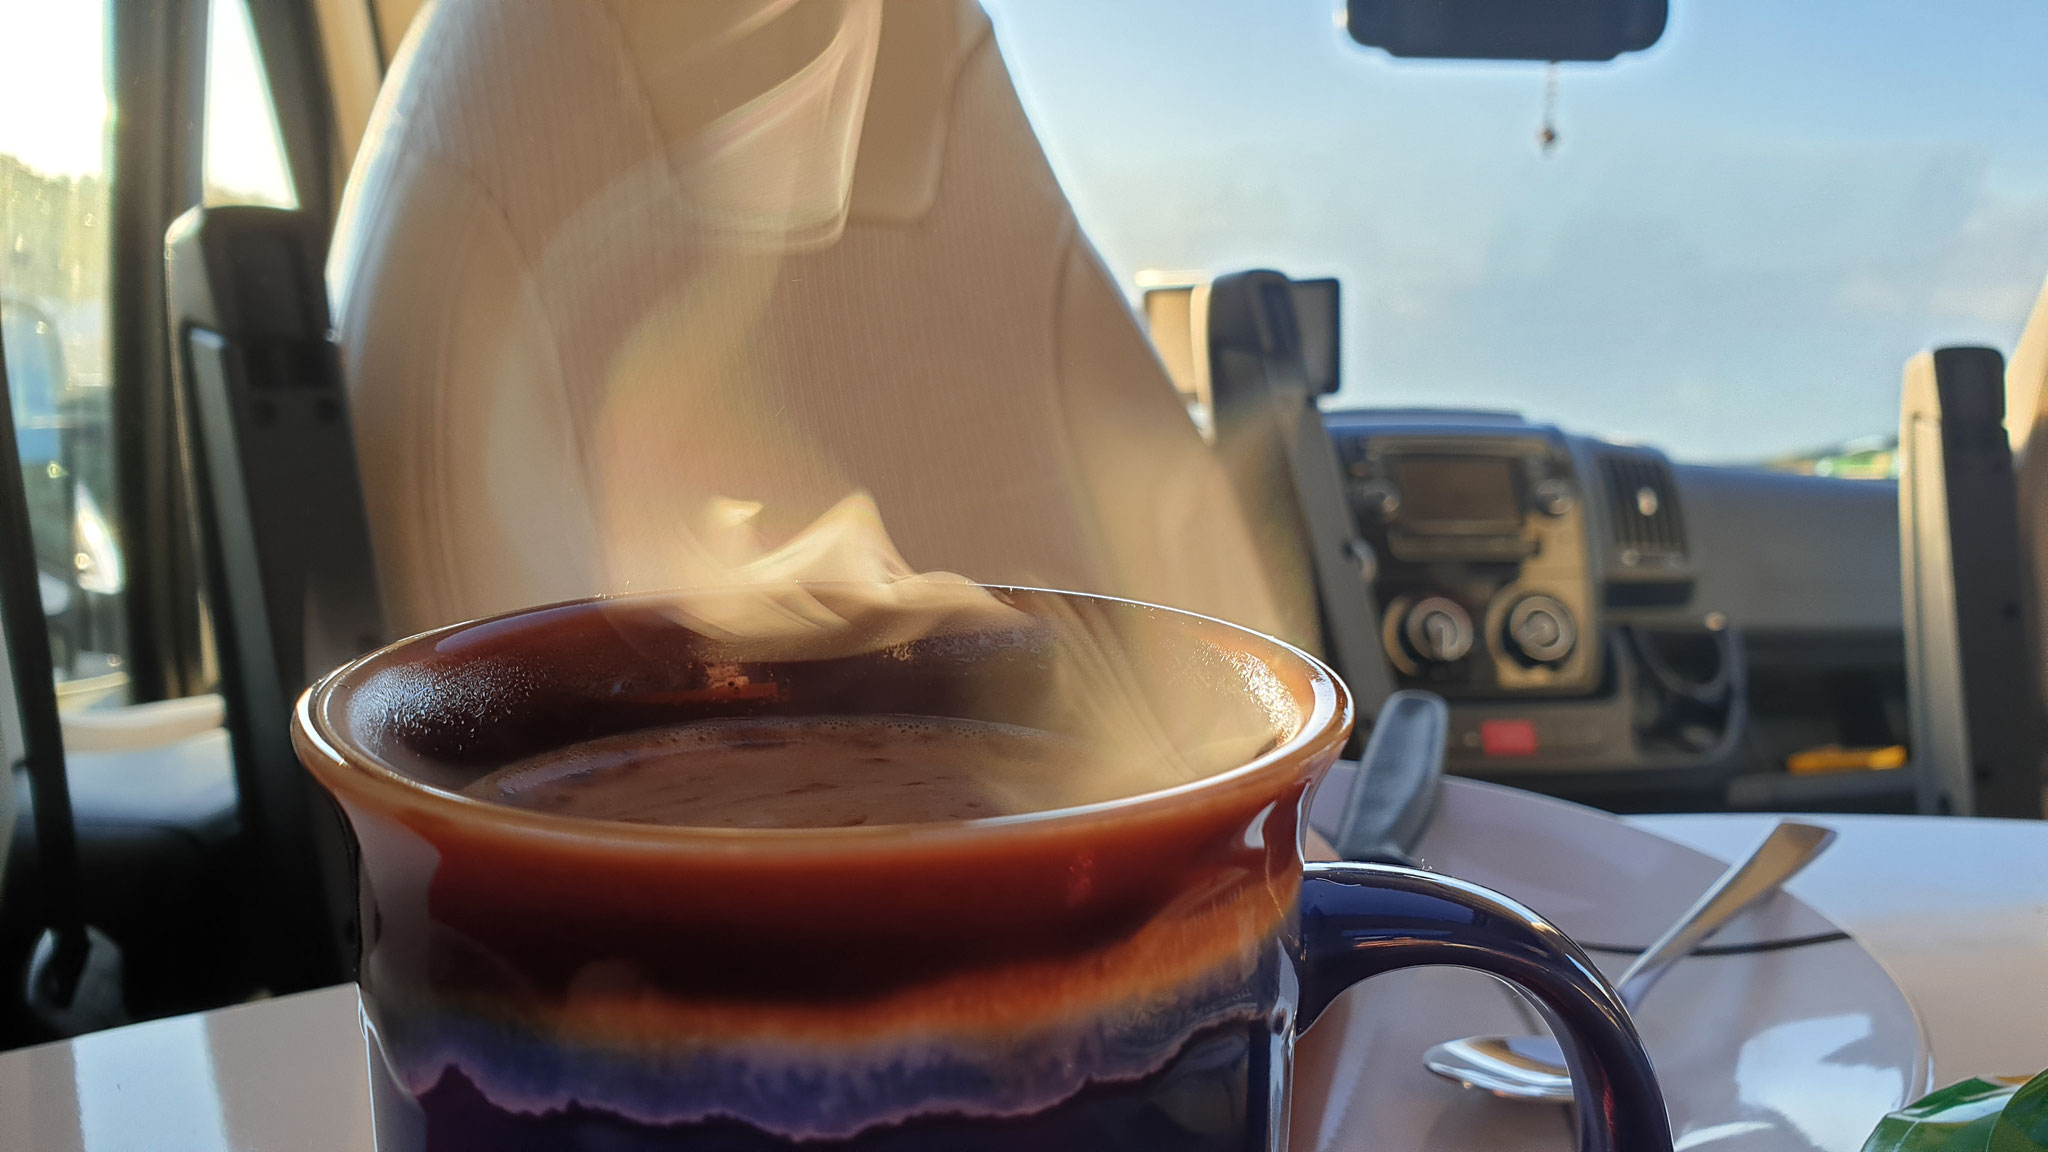 Duftender Kaffee am Morgen